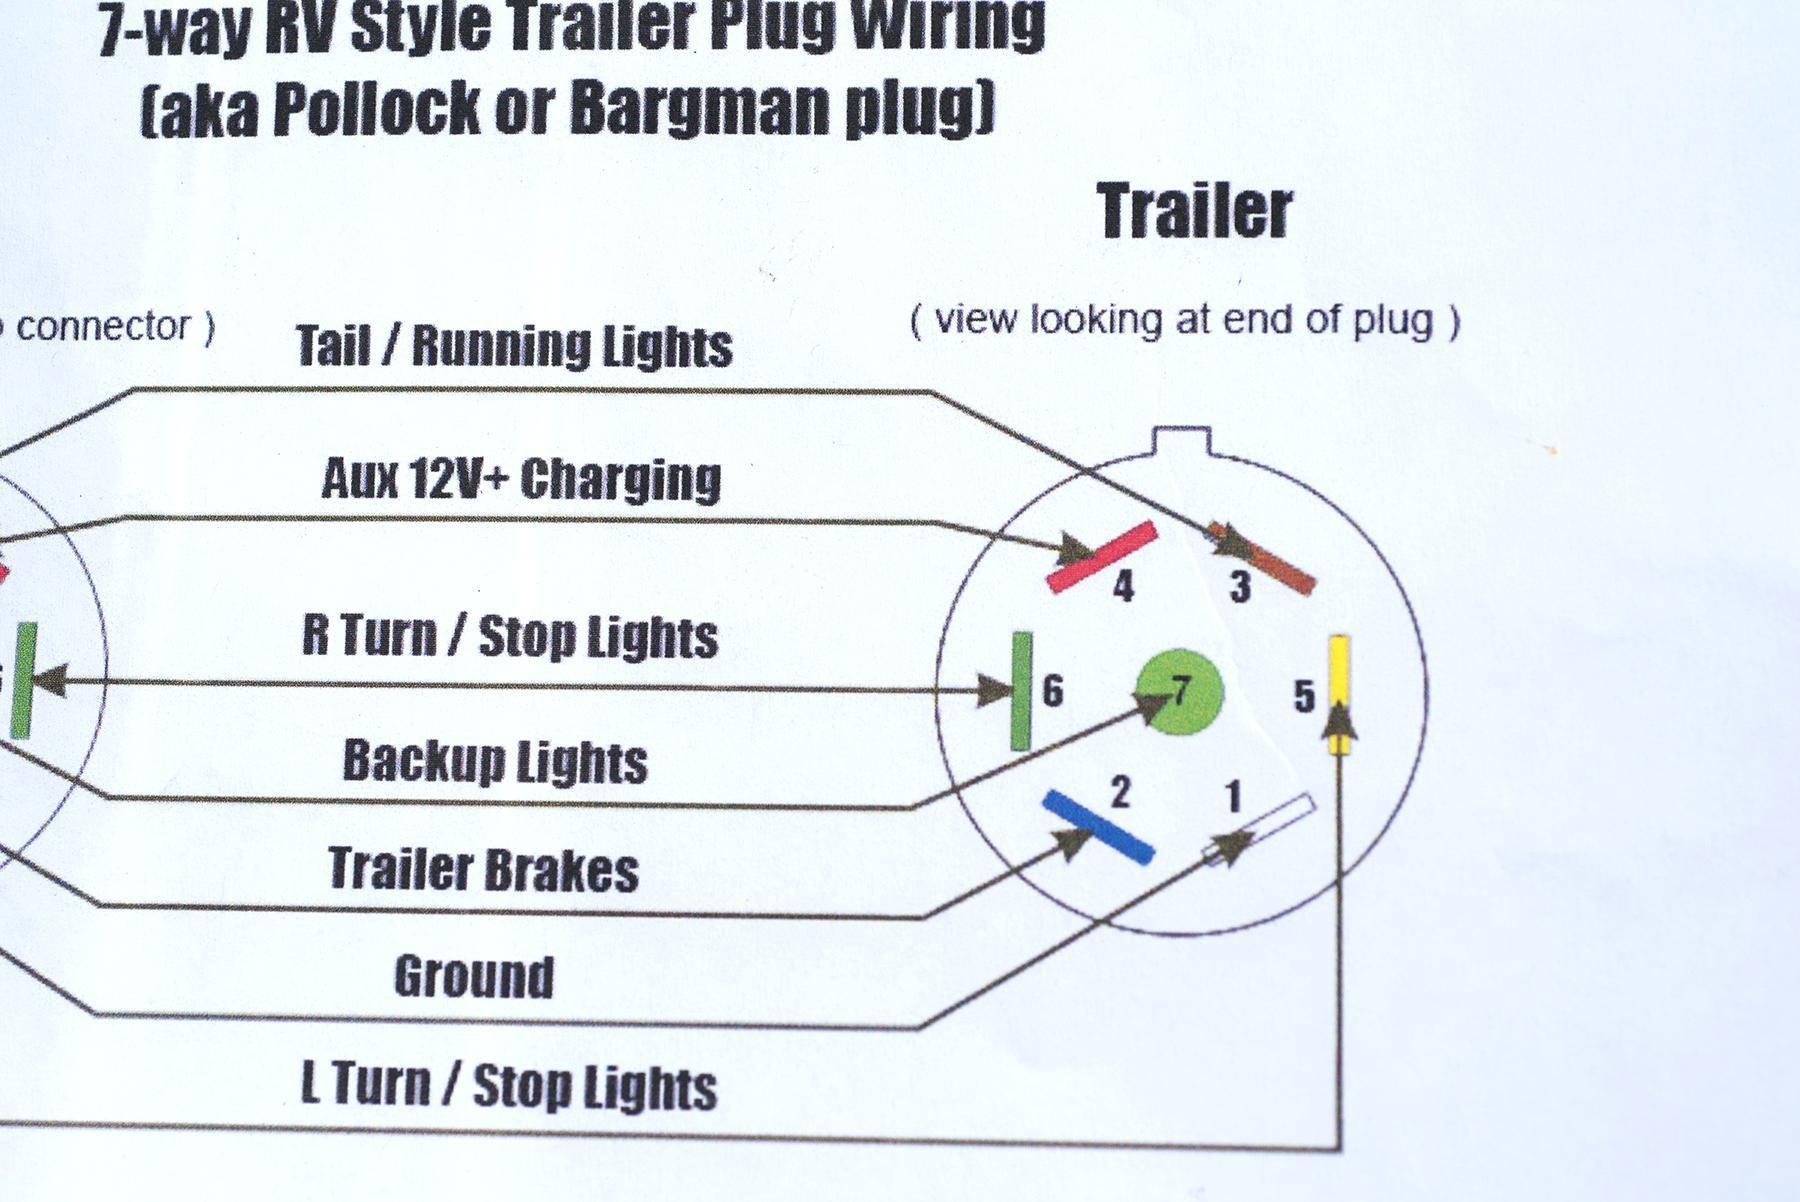 Boat Trailer Lights Wiring Diagram Wiring Diagram Semi Trailer Lights Fresh Semi Trailer Abs Wiring Of Boat Trailer Lights Wiring Diagram